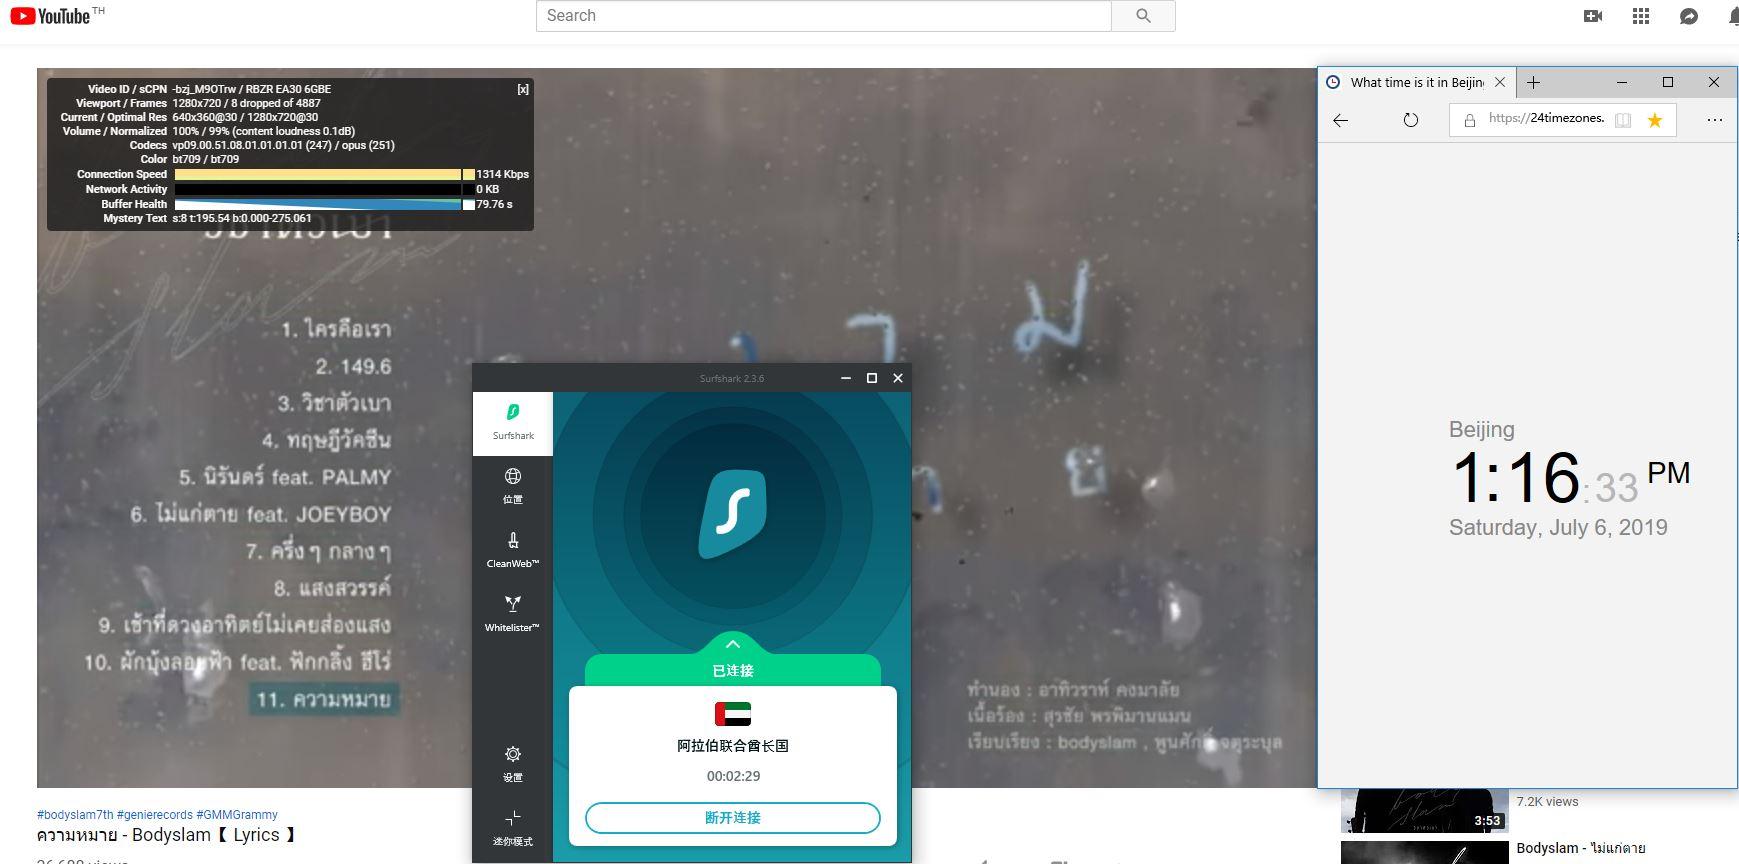 Windows Surfshark 阿拉伯联合酋长国节点 翻墙科学上网测试-YouTube-20190706.JPG